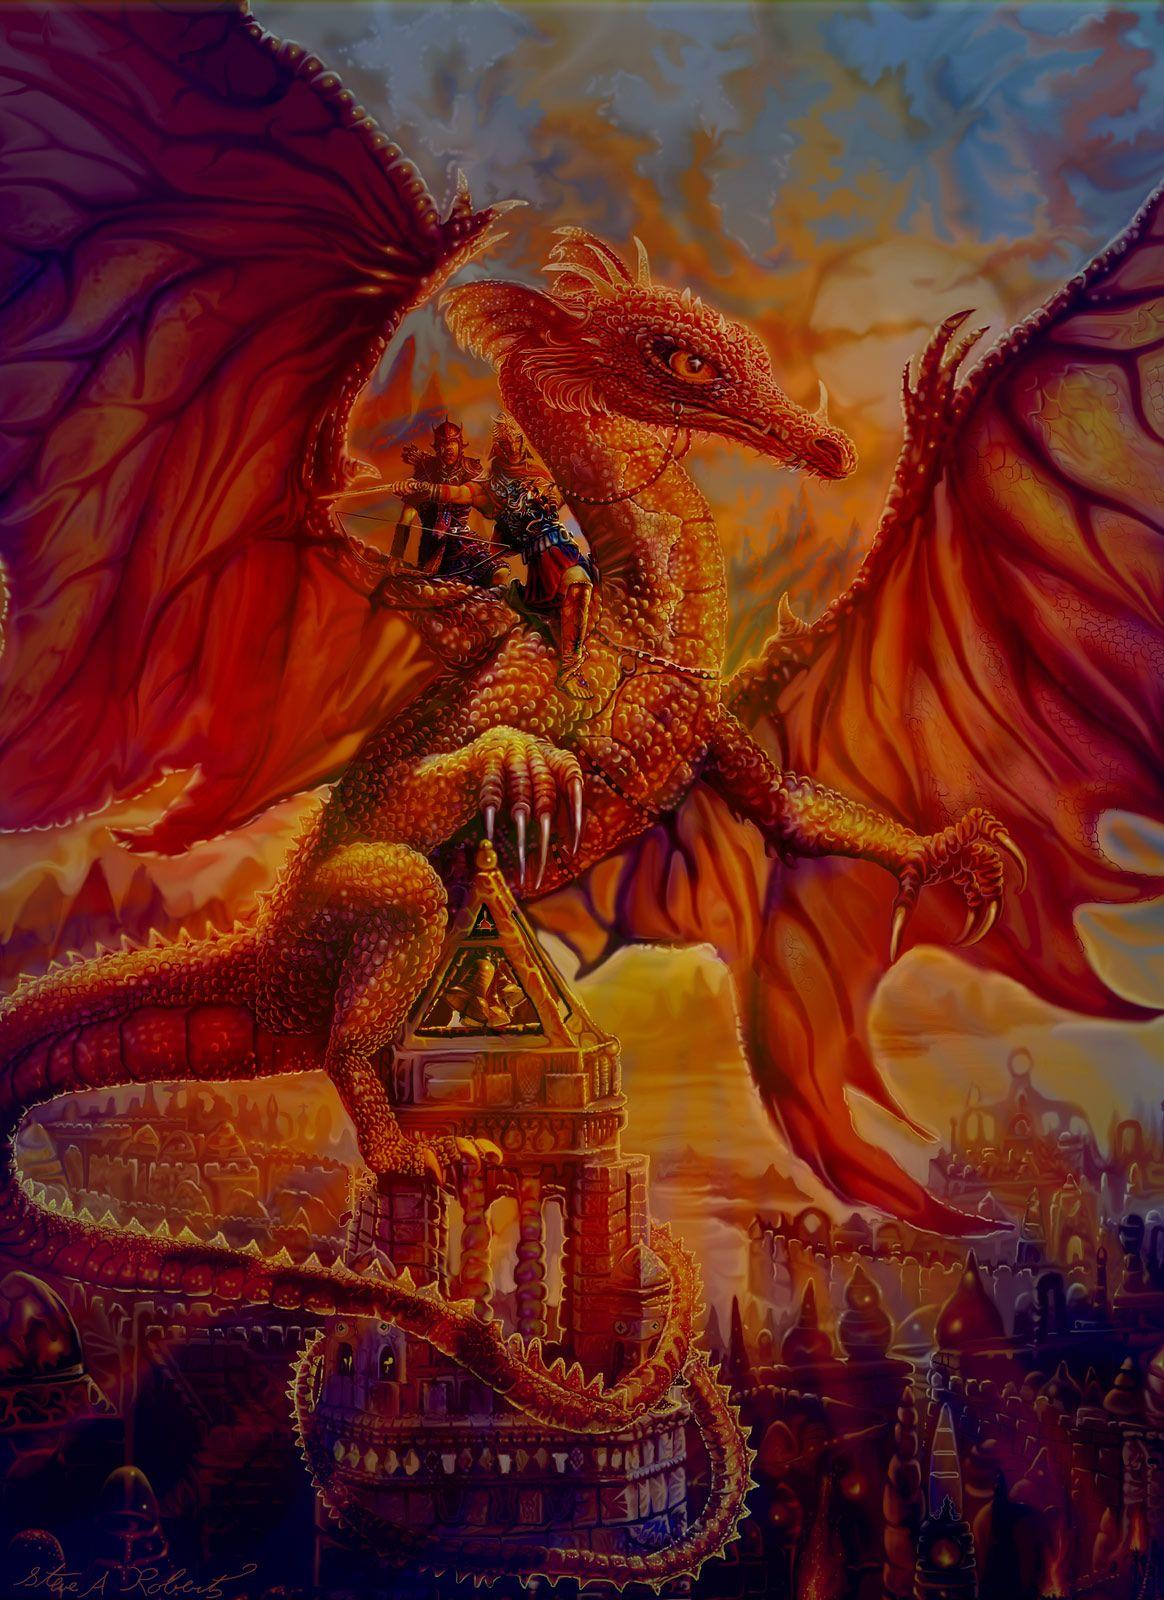 Fantasy dragons art gallery dragon picturea magical fantasy fantasy dragons art gallery dragon picturea magical fantasy artwork of a mighty voltagebd Choice Image